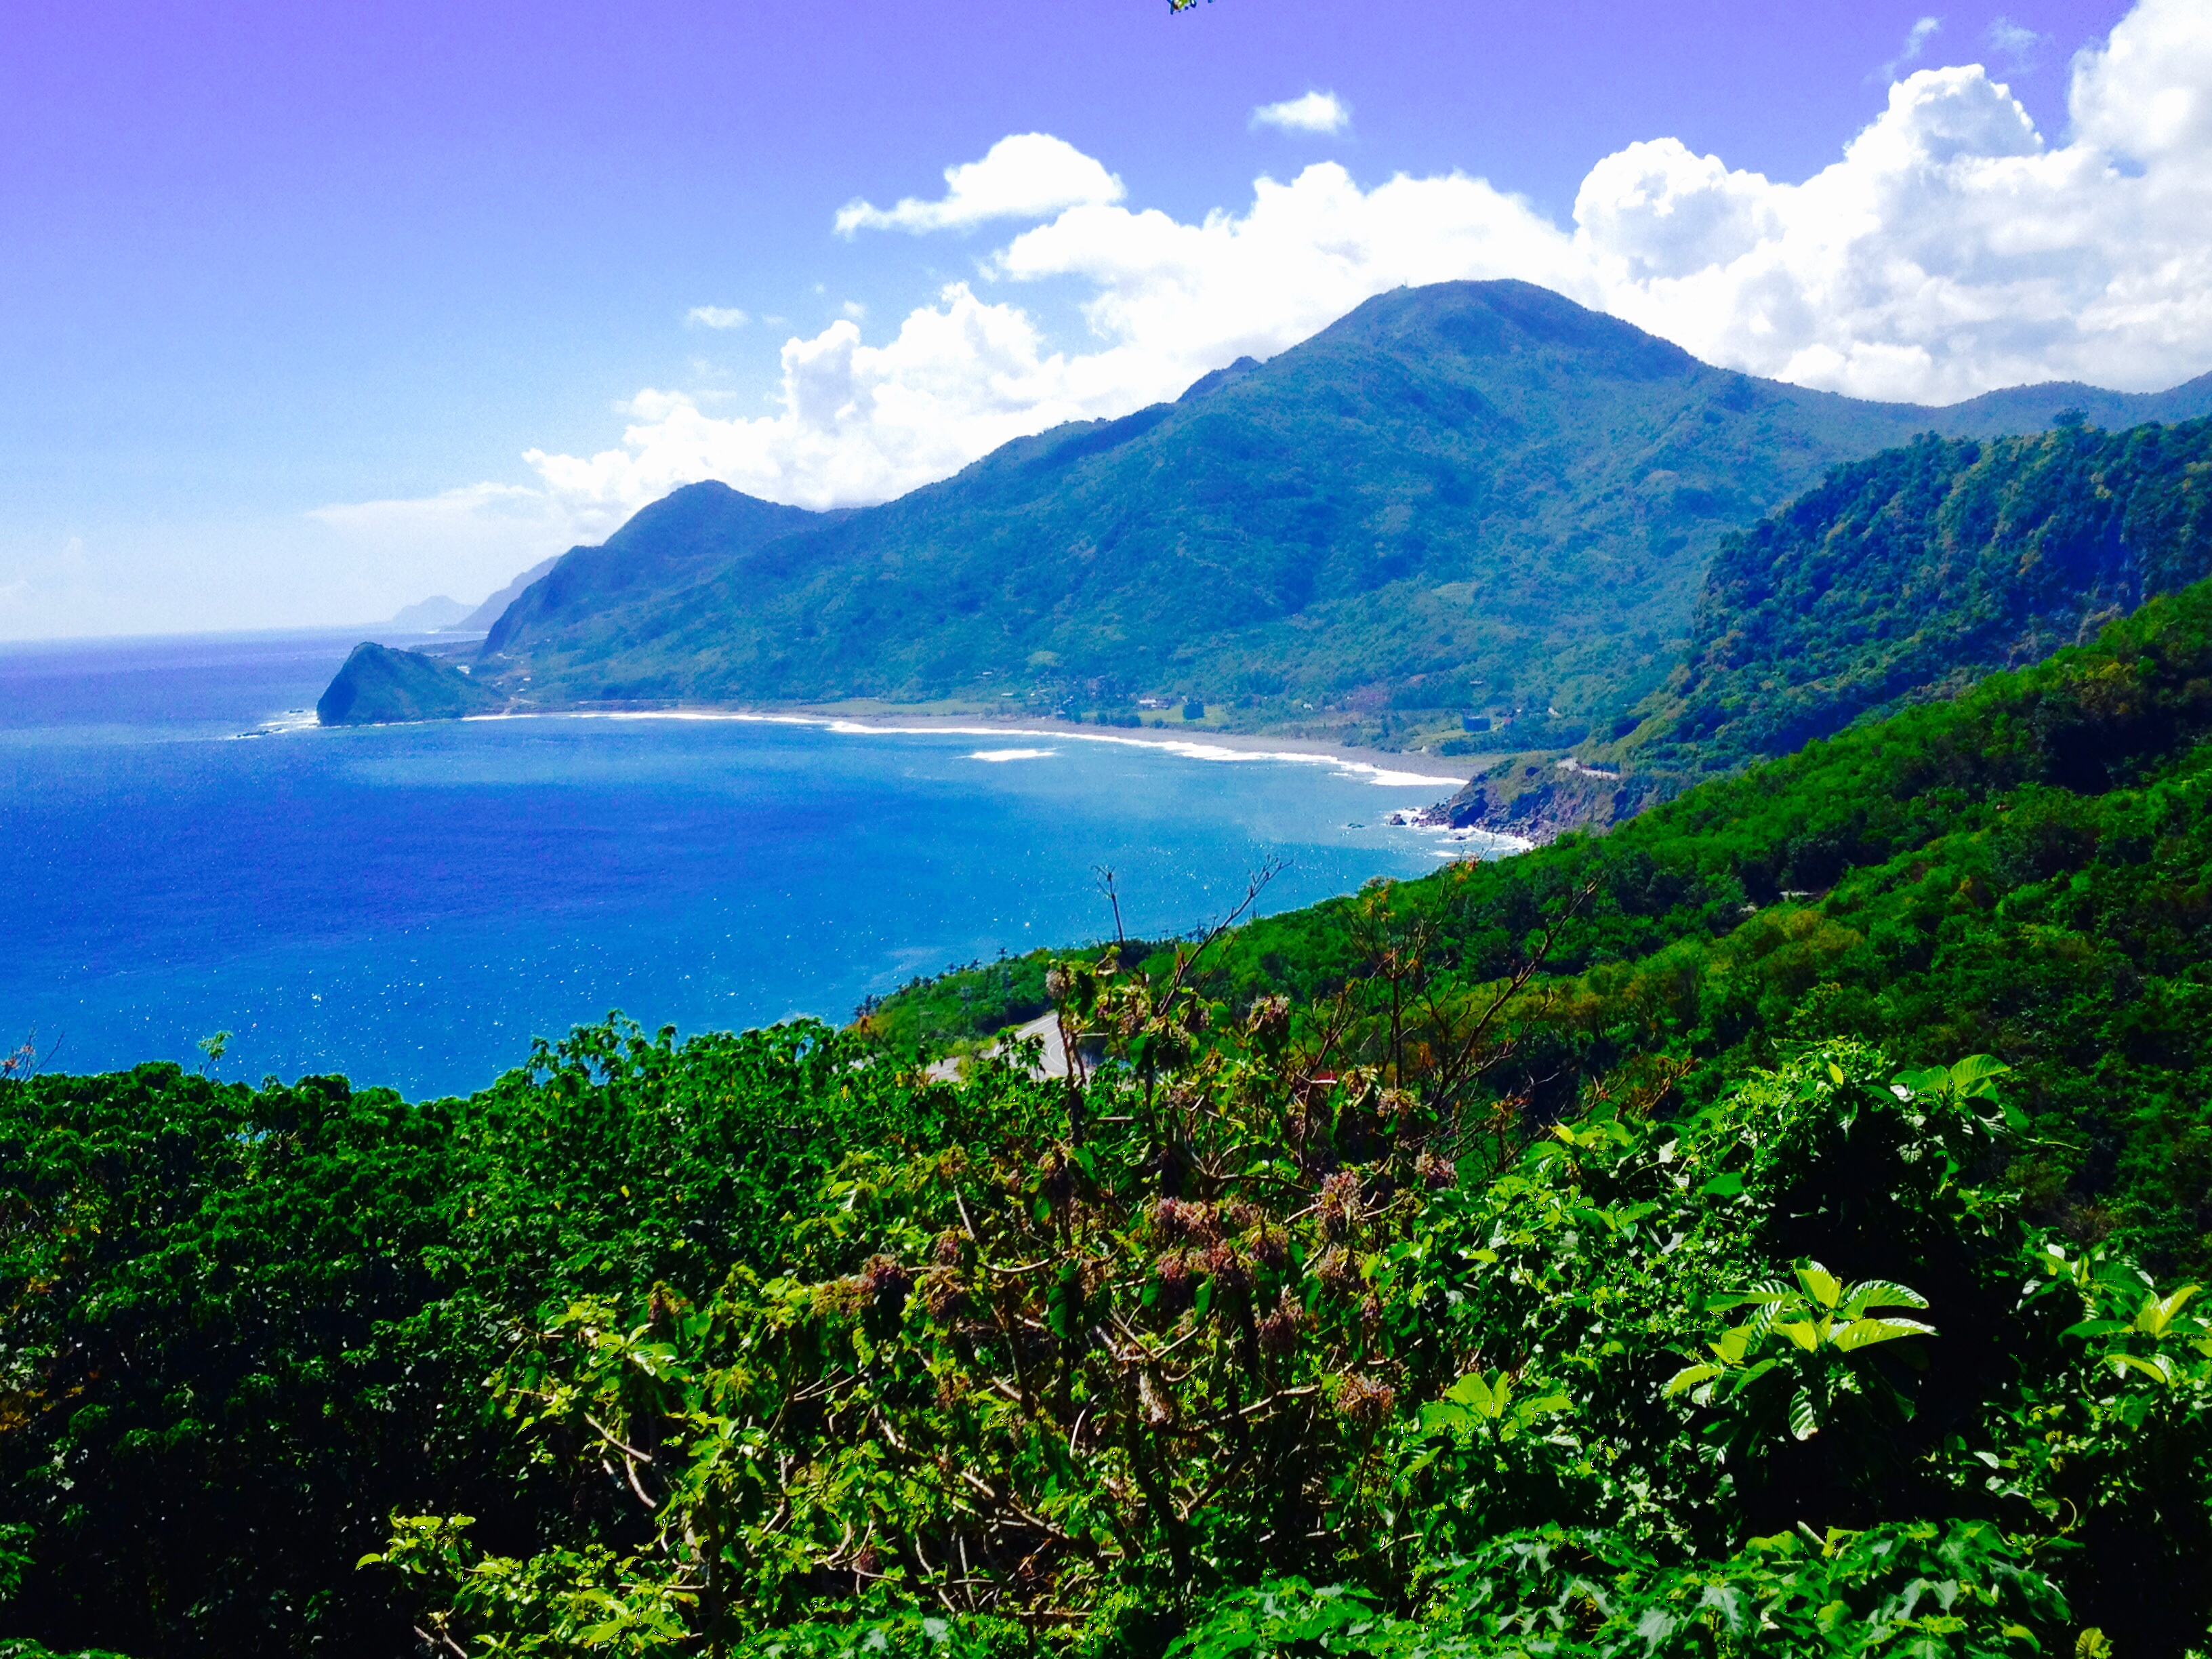 beautiful island formosa 10 best secret islands around the world (penghu islands – taiwan)  8  taiwan's southern tip boasts beautiful white sand beaches, such as those that  make.